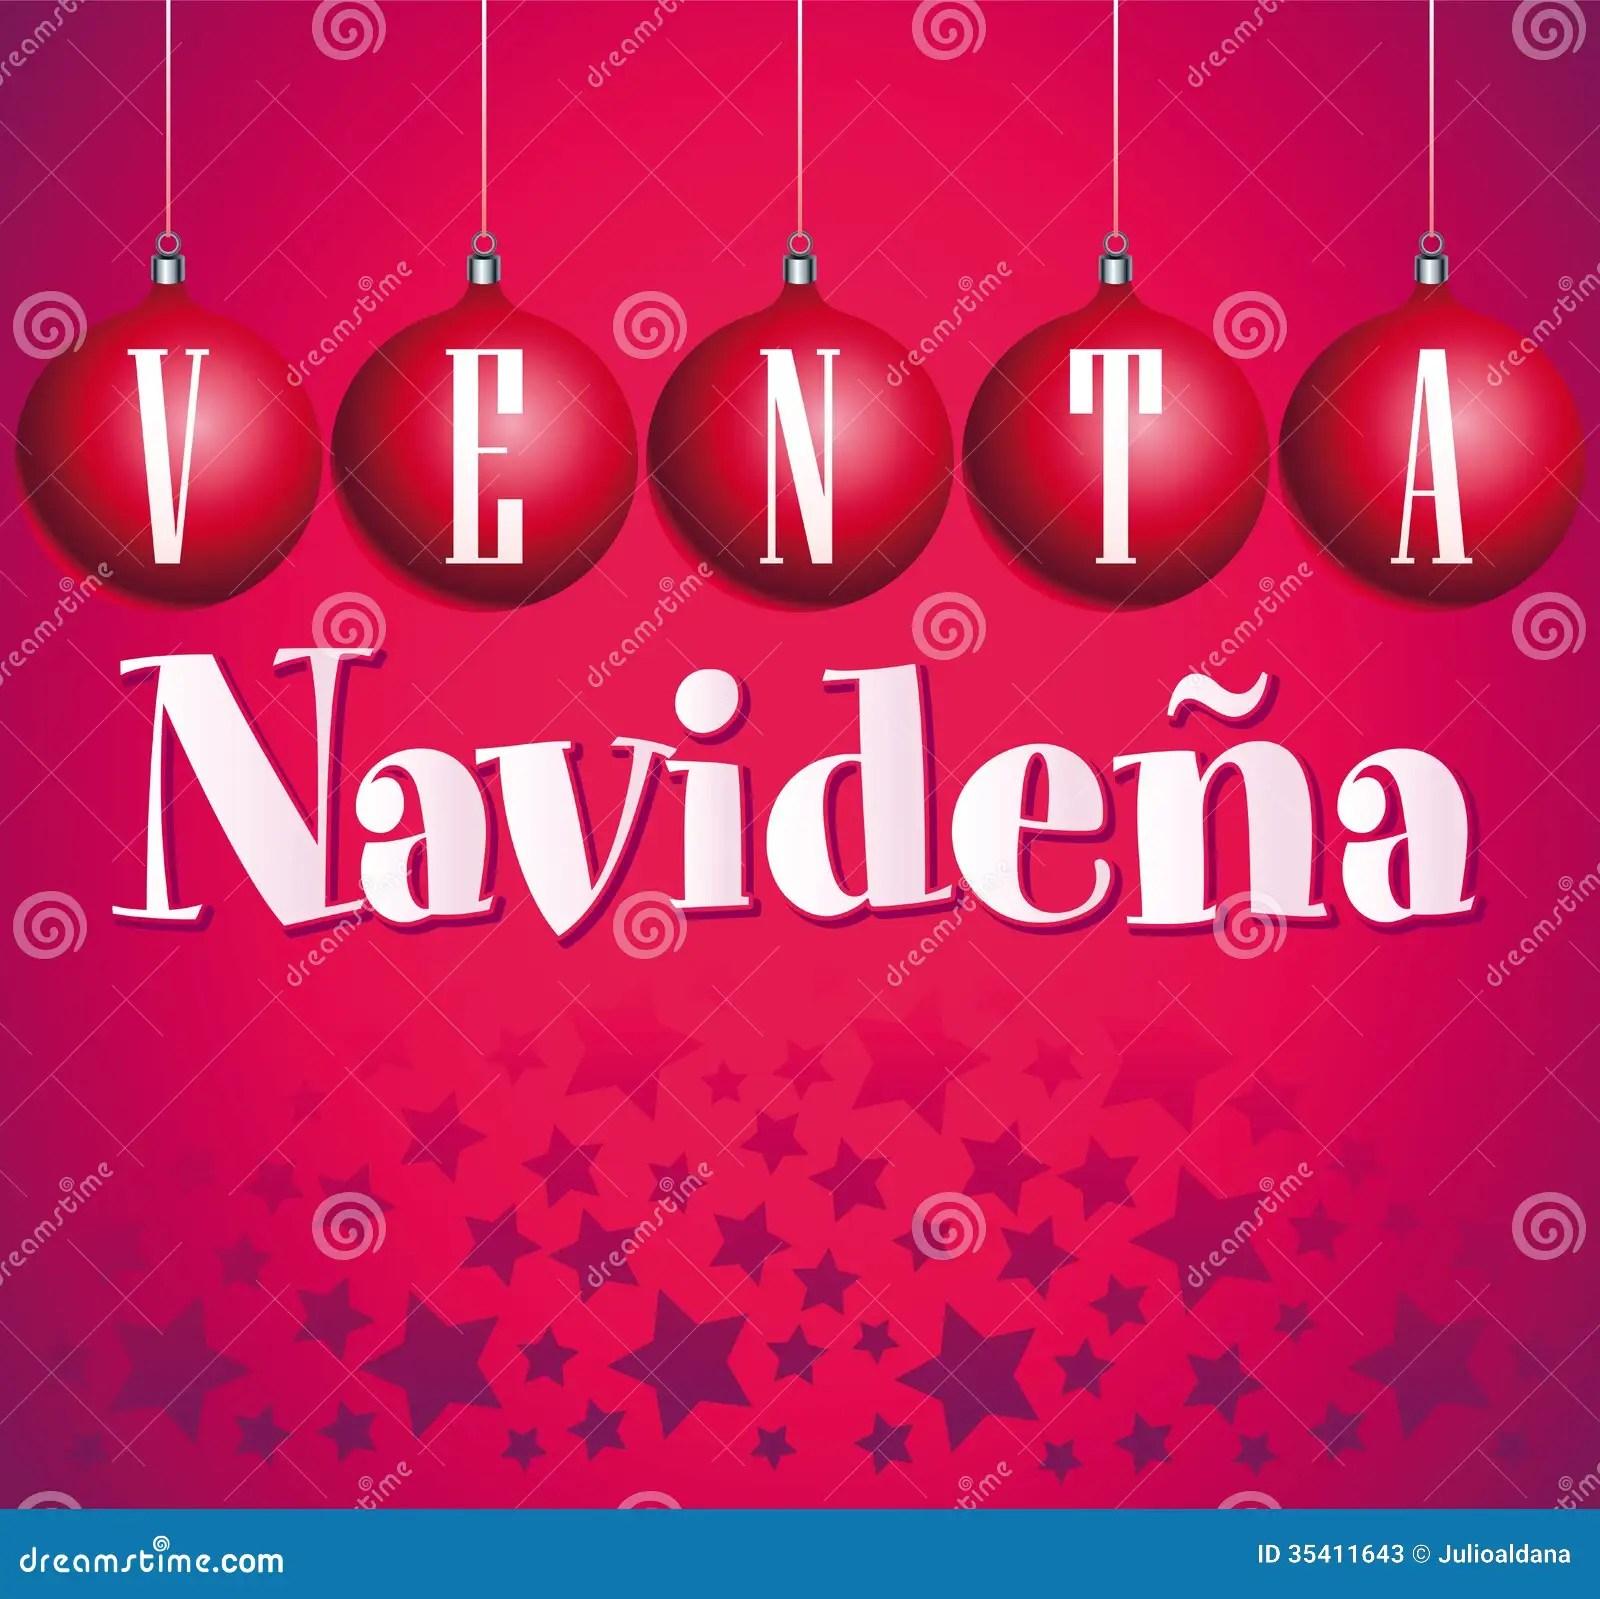 Venta Navidena Christmas Sale Spanish Stock Photos